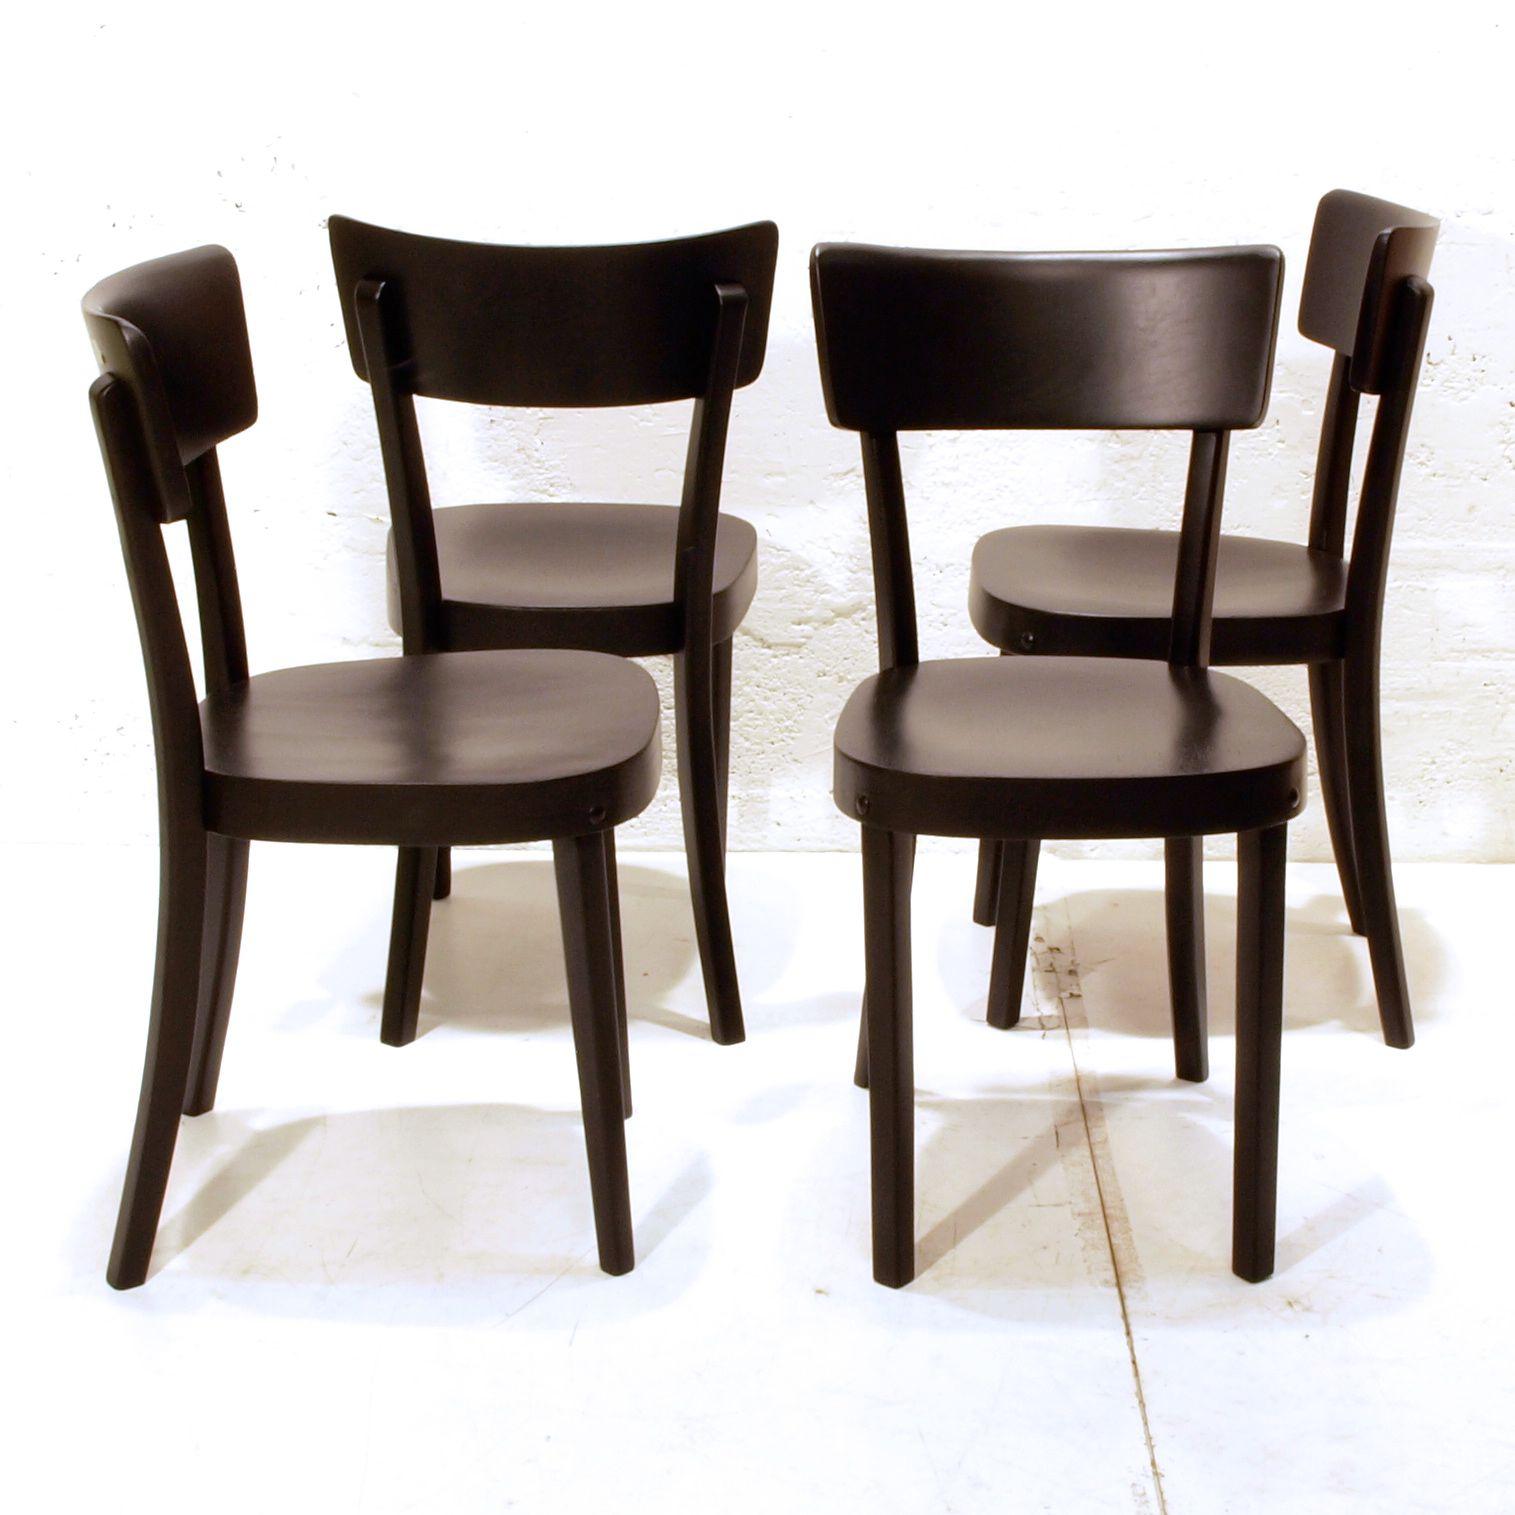 Horgen glarus st hle schwarz lackiert verschiedene for Designklassiker stuhl holz